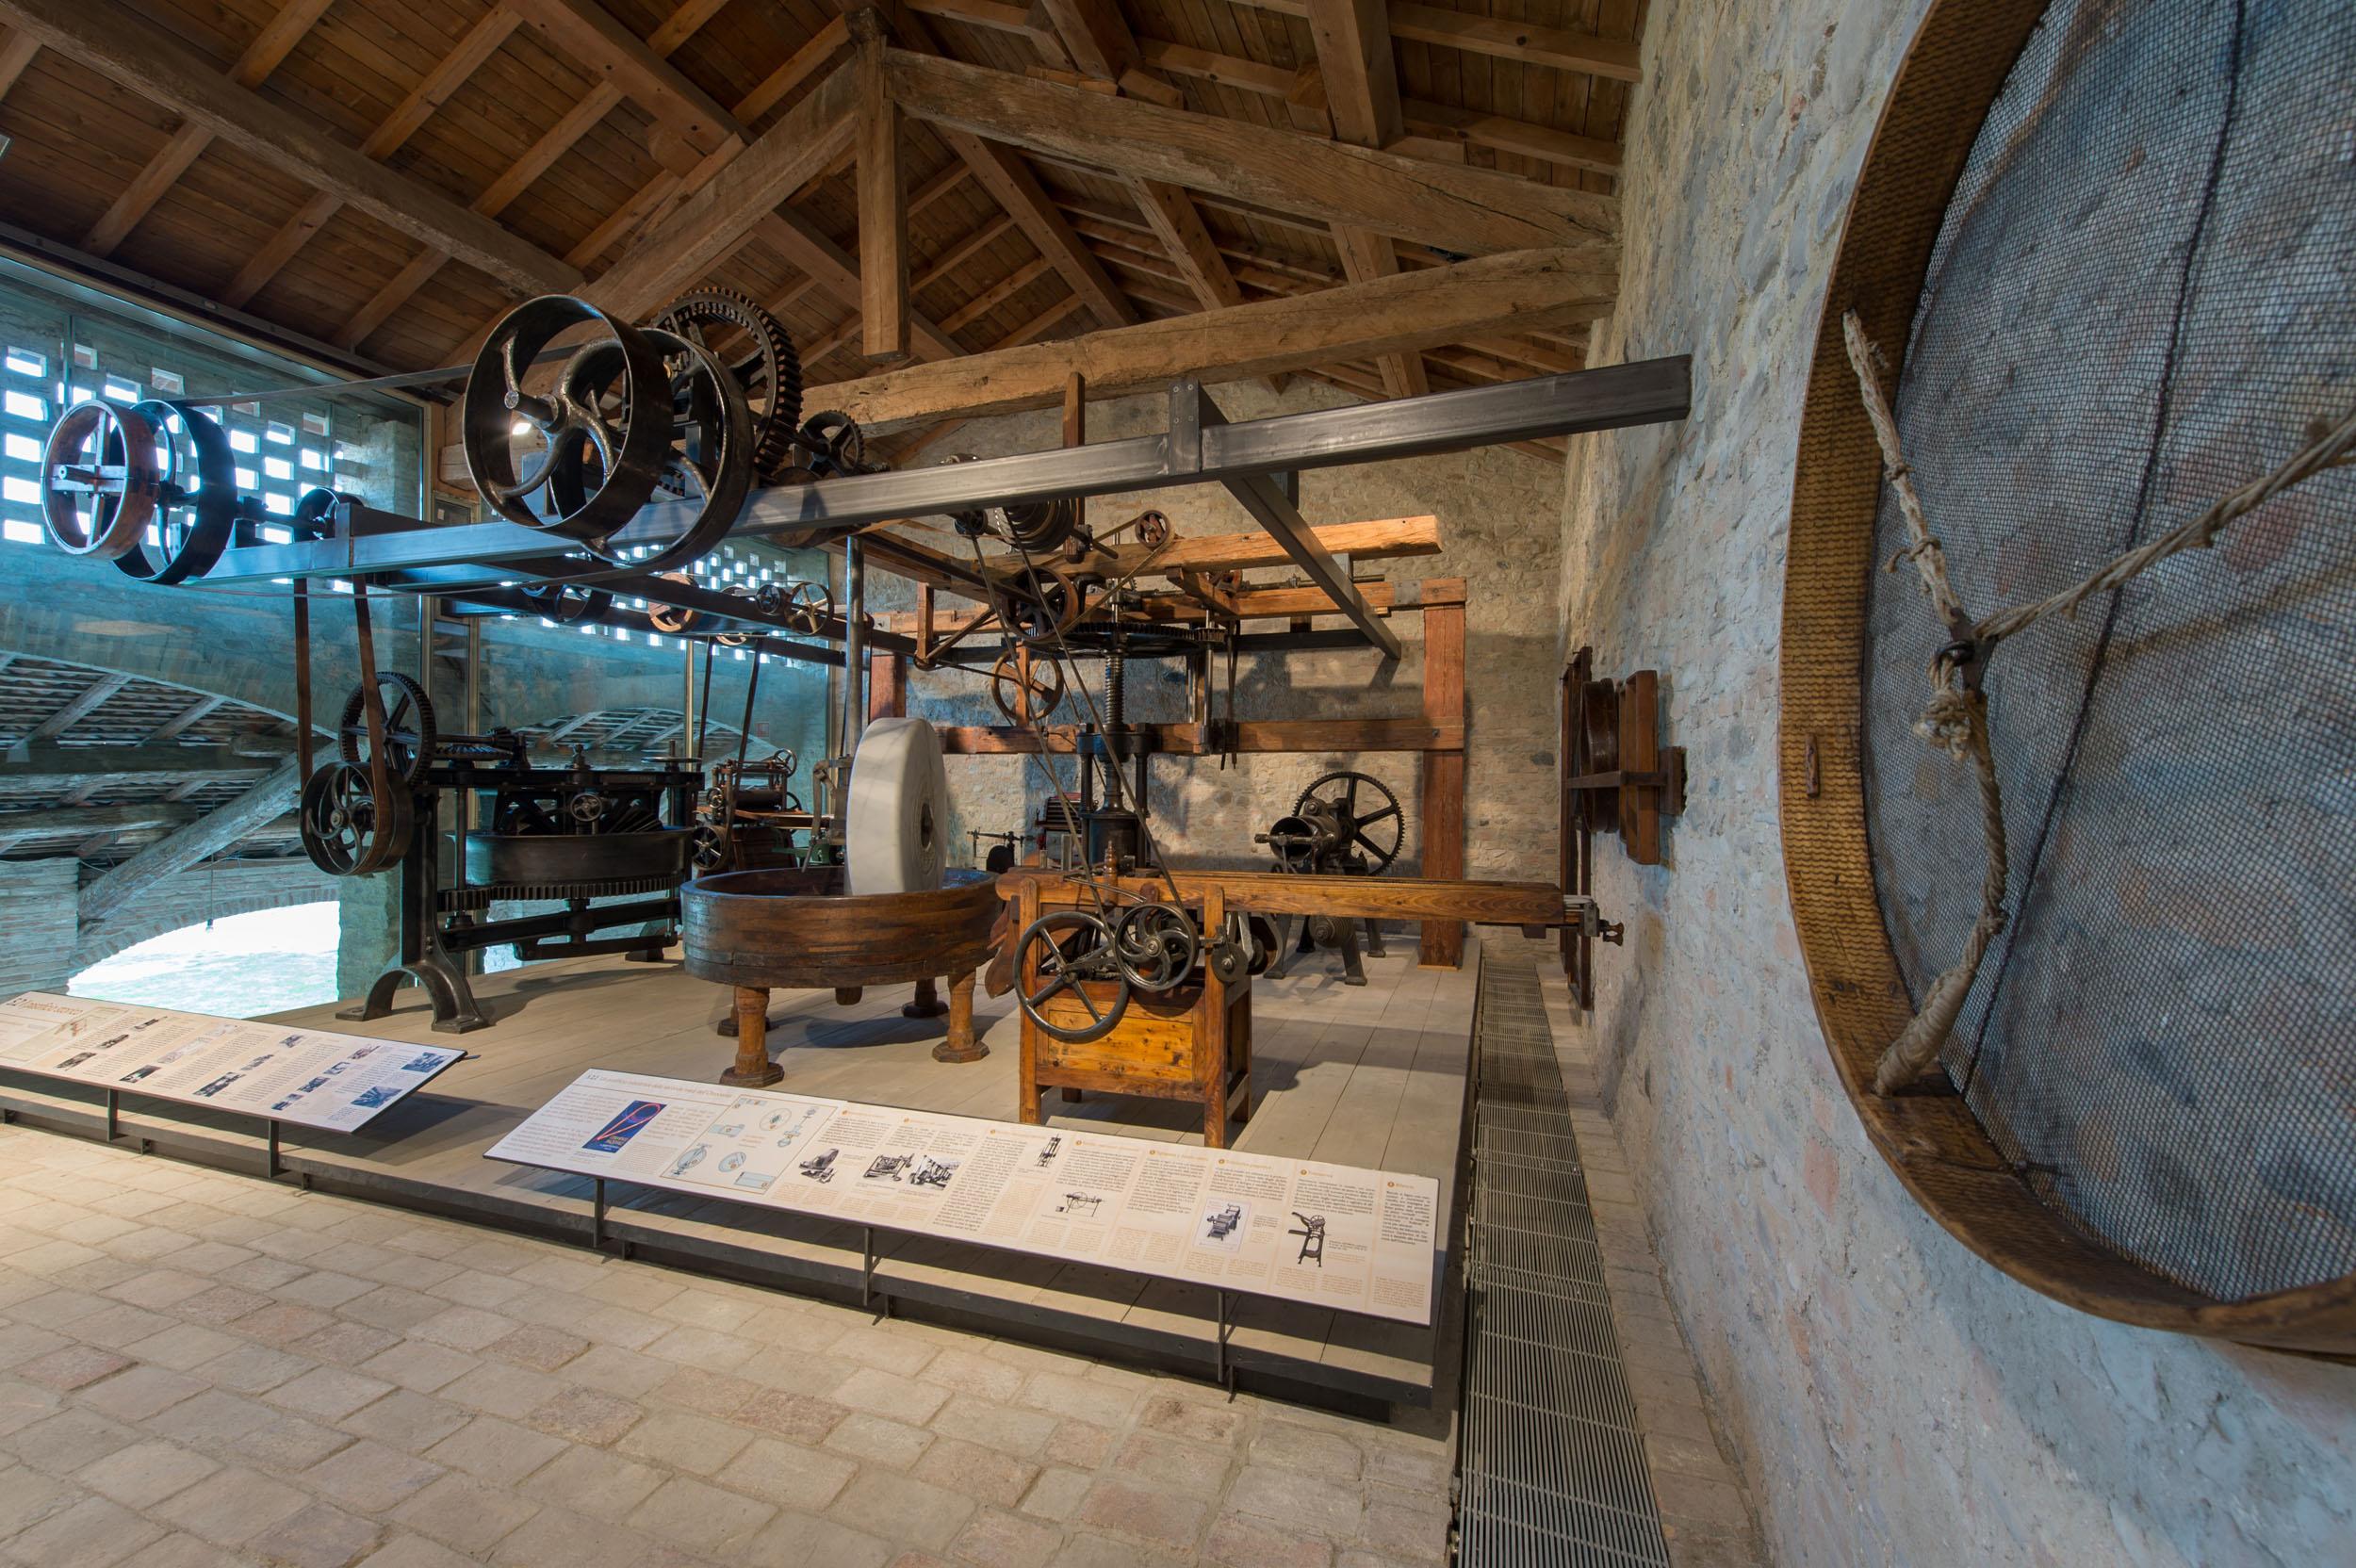 Pasta Museum in Collecchio (PR), interior n. 4 (Picture by L. Rossi)